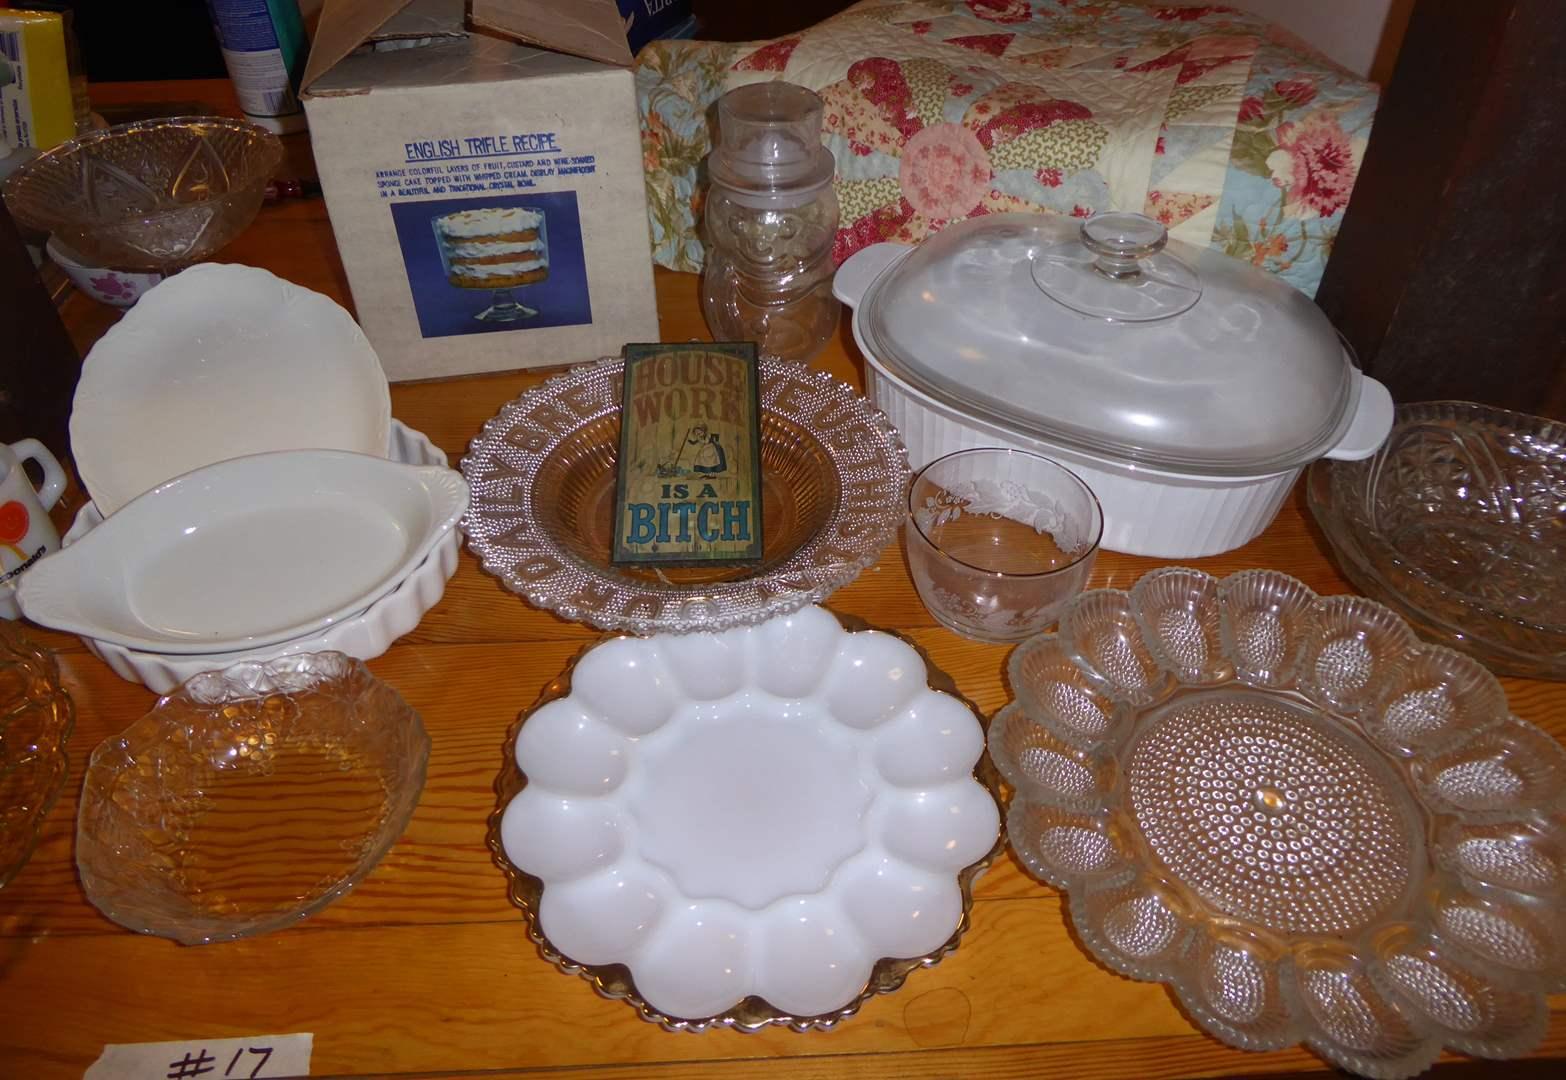 Lot # 17 - Egg Plates, Trifle Dish & Vintage Mugs  (main image)